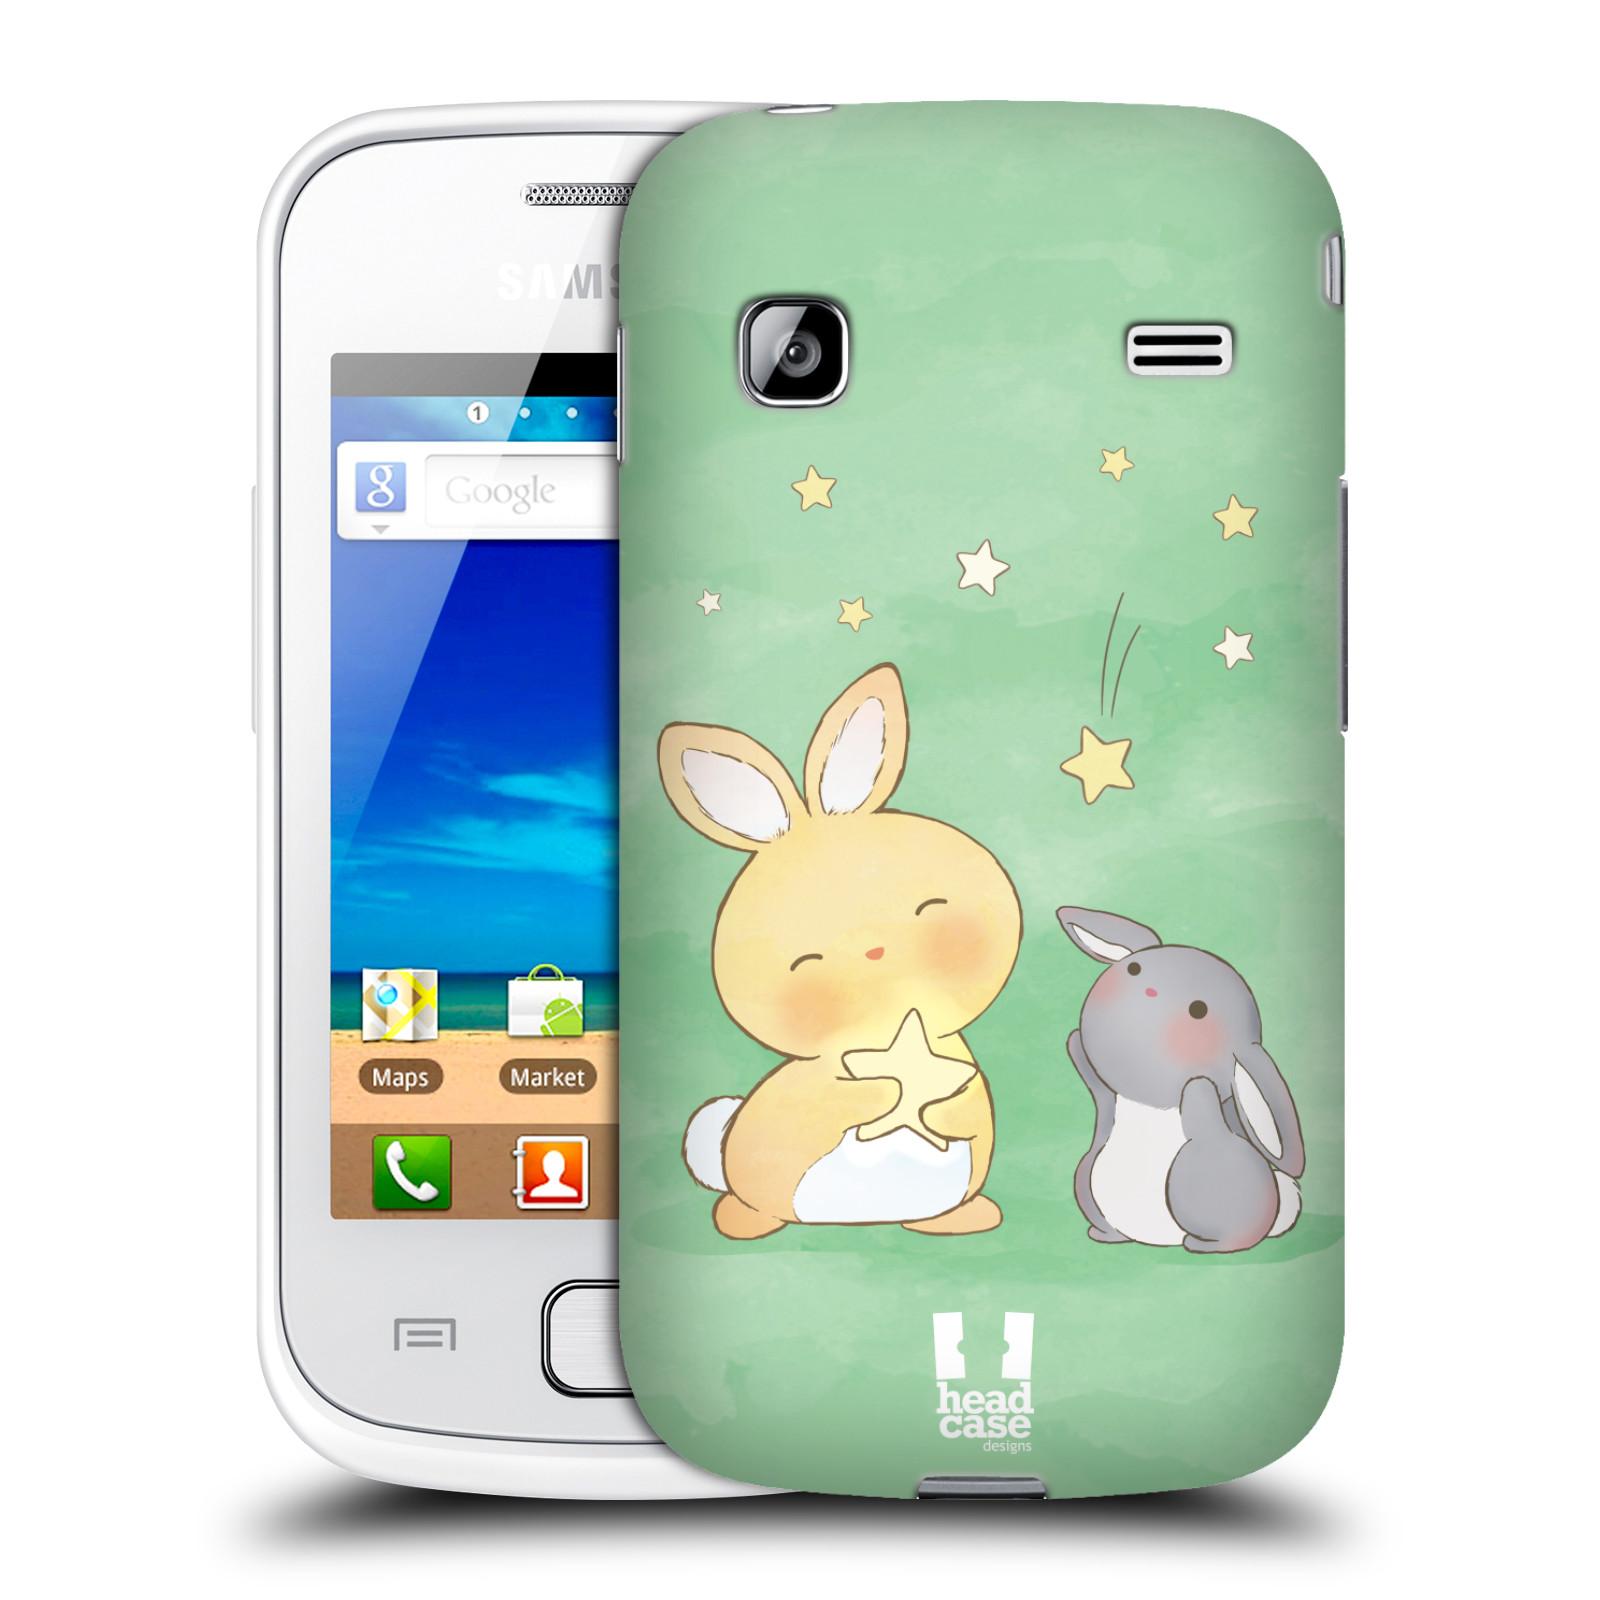 HEAD CASE plastový obal na mobil SAMSUNG GALAXY GIO (S5660) vzor králíček a hvězdy zelená